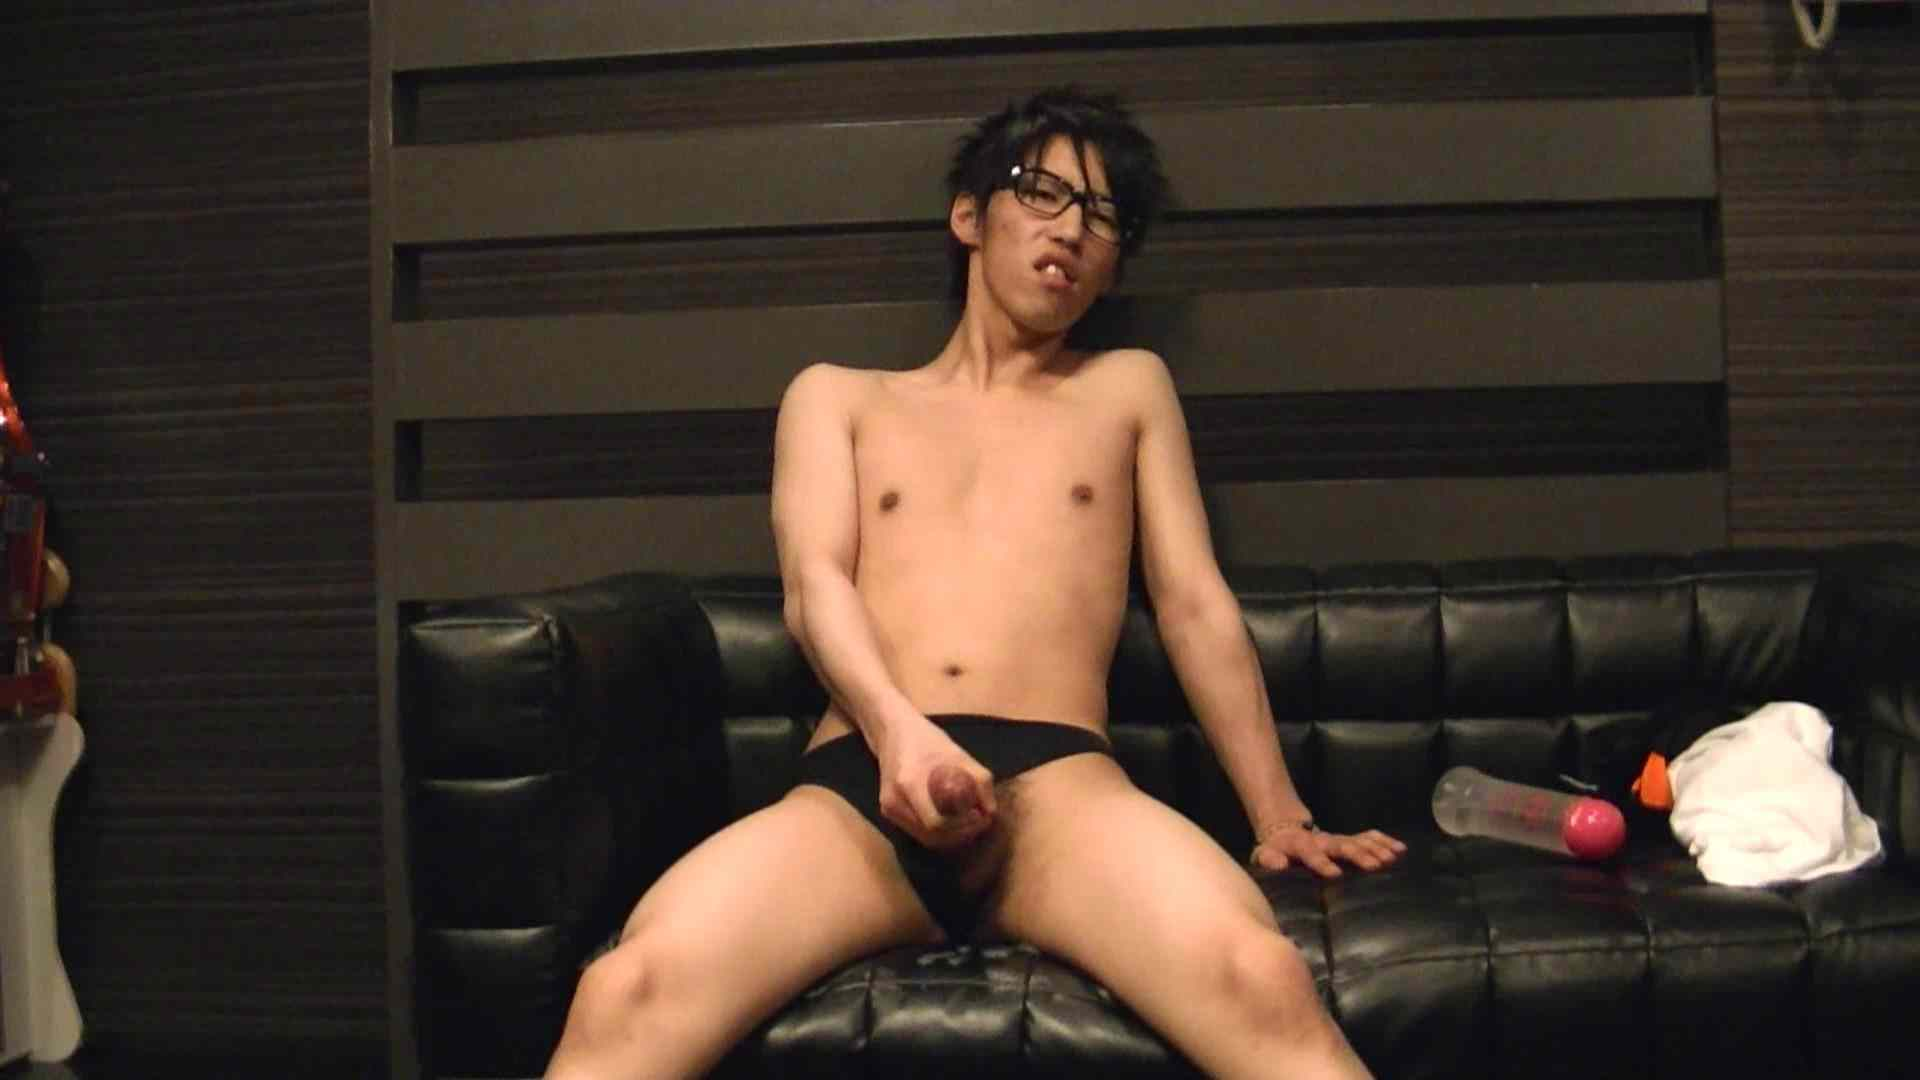 ONA見せカーニバル!! Vol3 男 ゲイ無料無修正画像 89枚 15